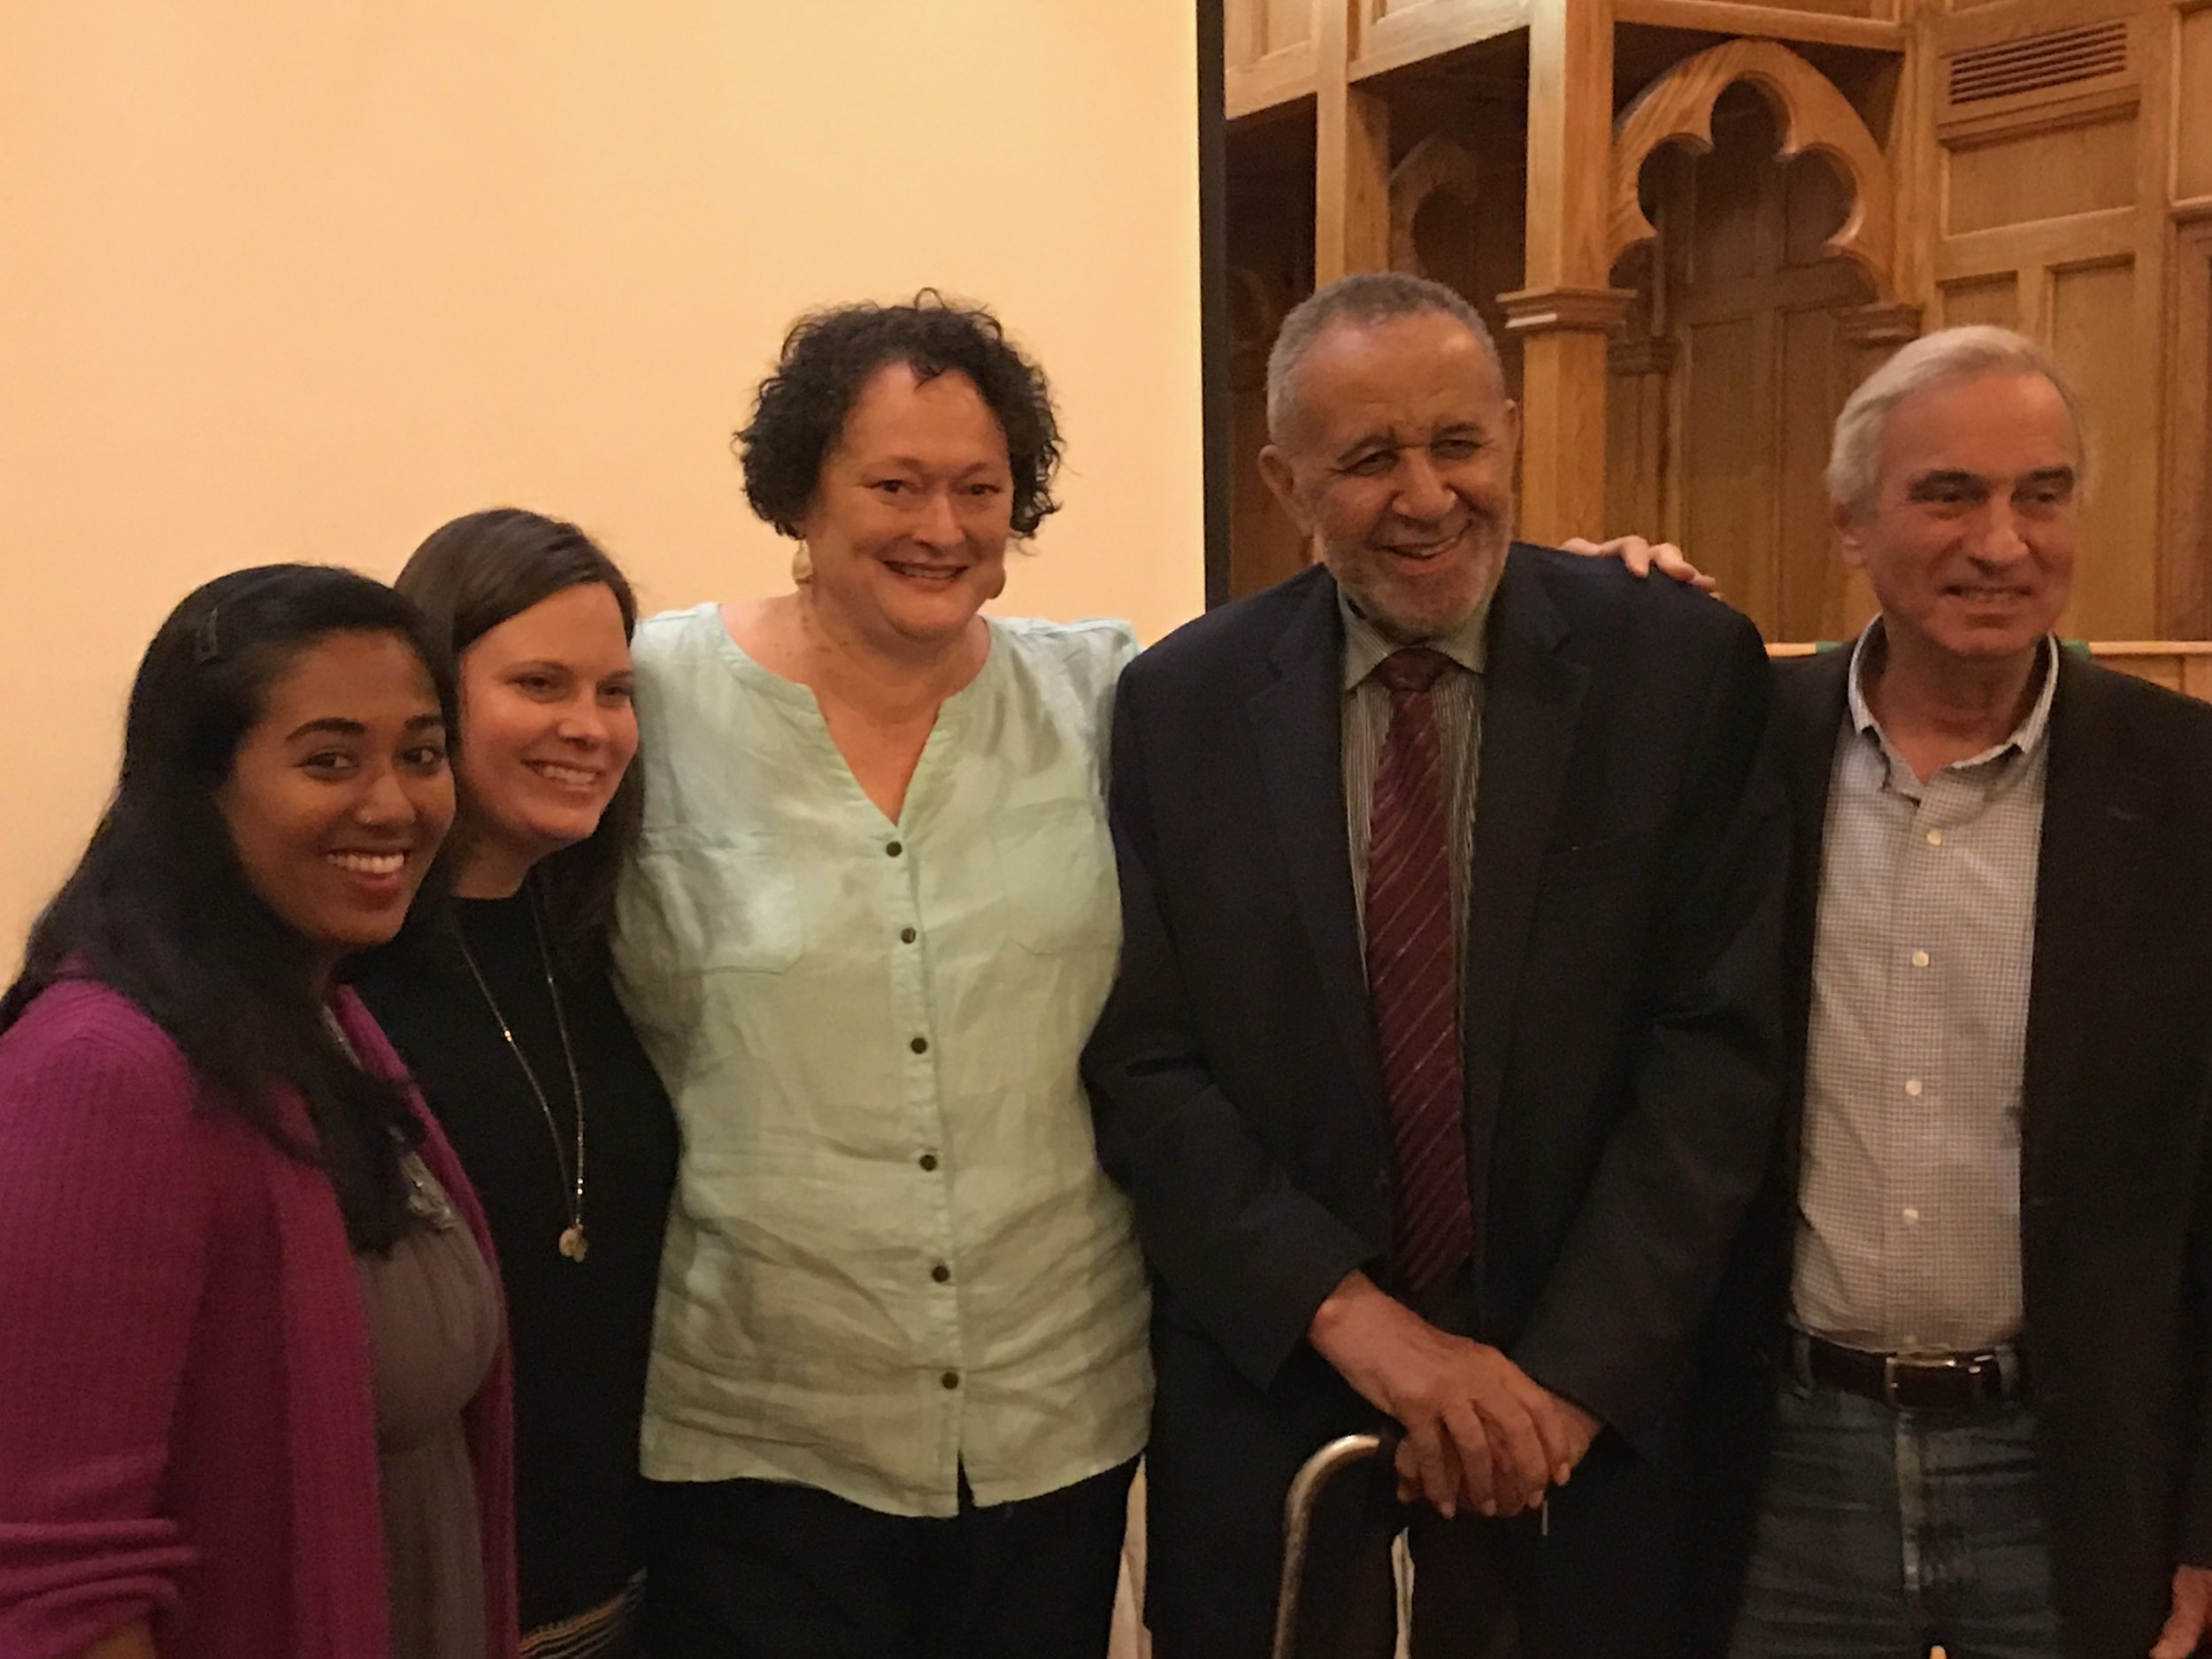 NORTH CAROLINA FILM TOUR 2017    Raleigh film screening, with panelist Manju Rajendran, moderator the Rev. Liz Roberts, and Jimmy Creech.